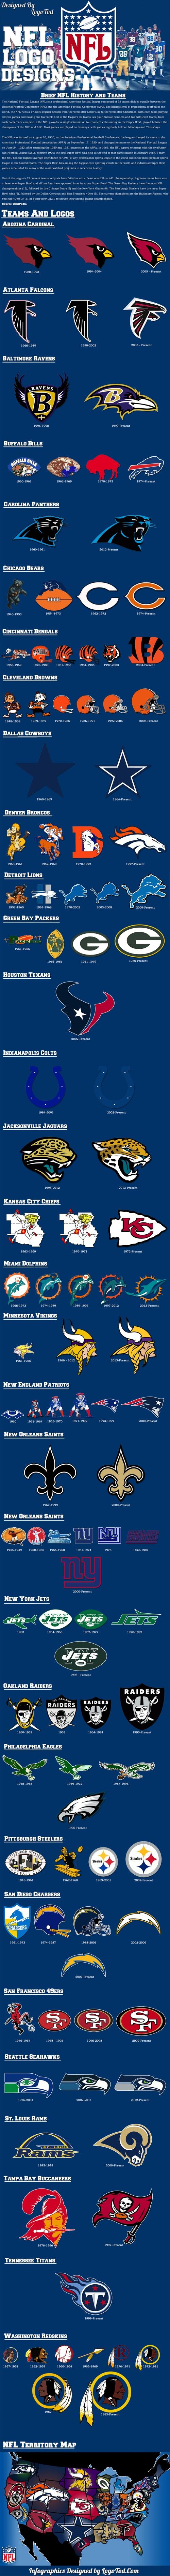 The History of NFL Logo Designs infogaphic